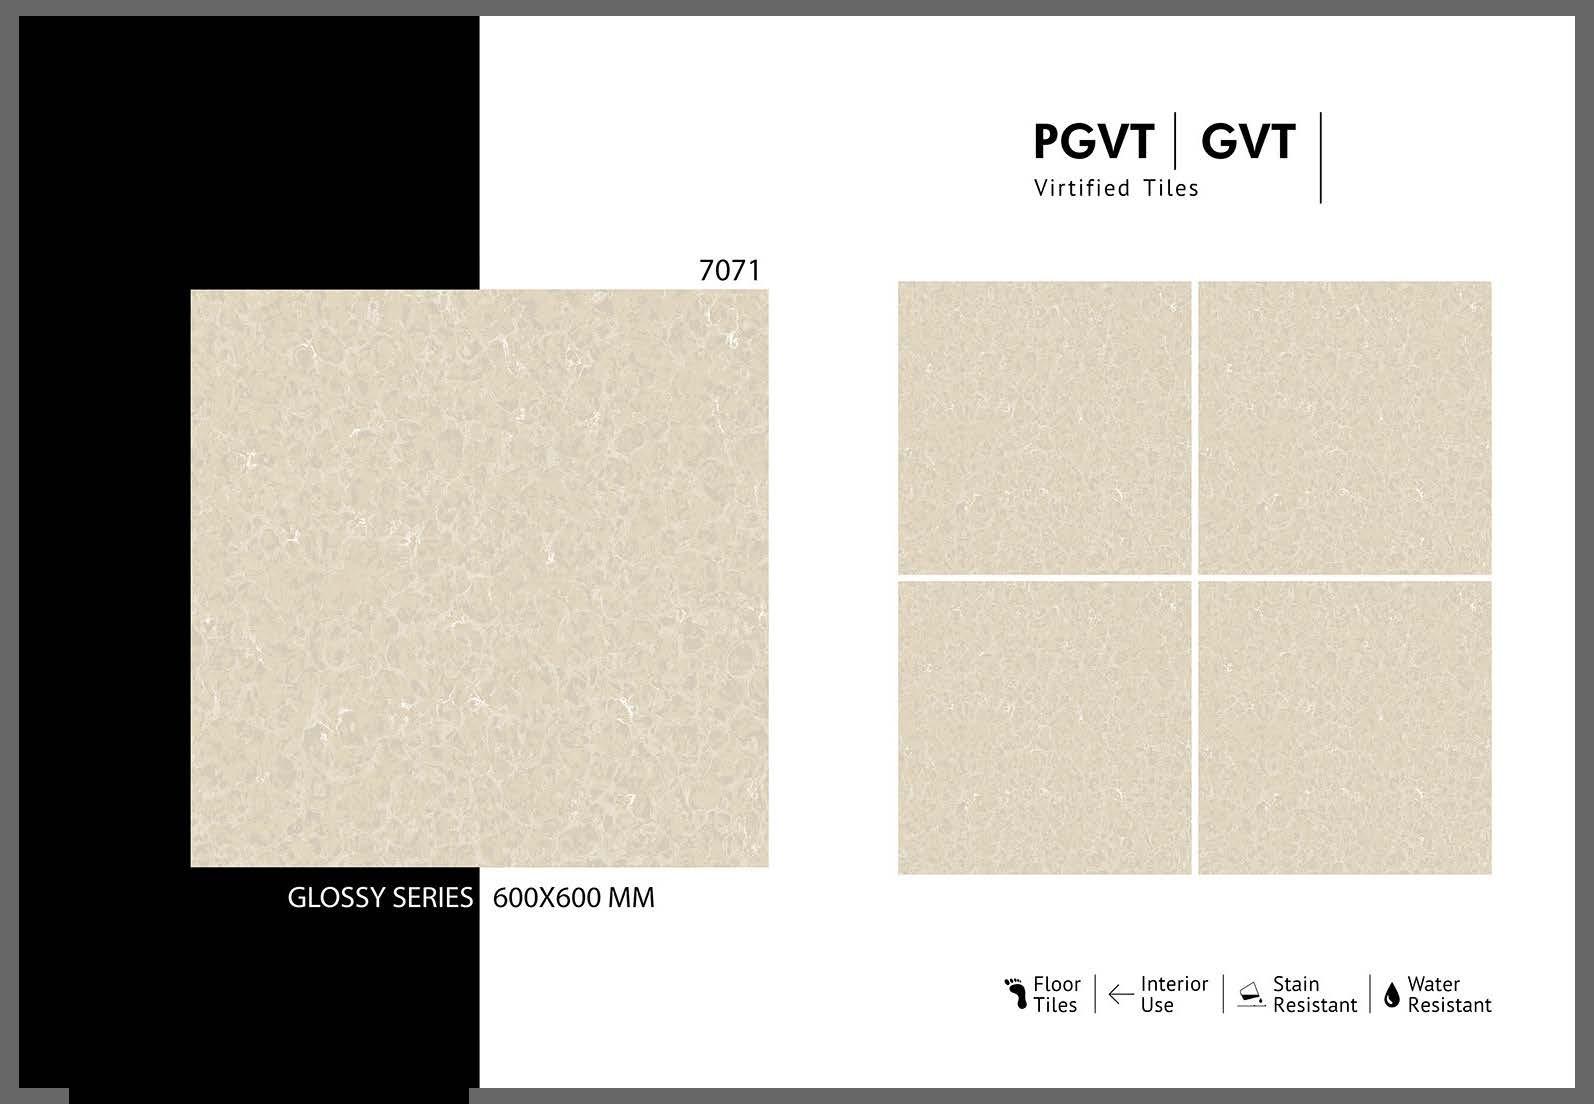 GVT 2X2 GLOSSY_Page_58.jpg